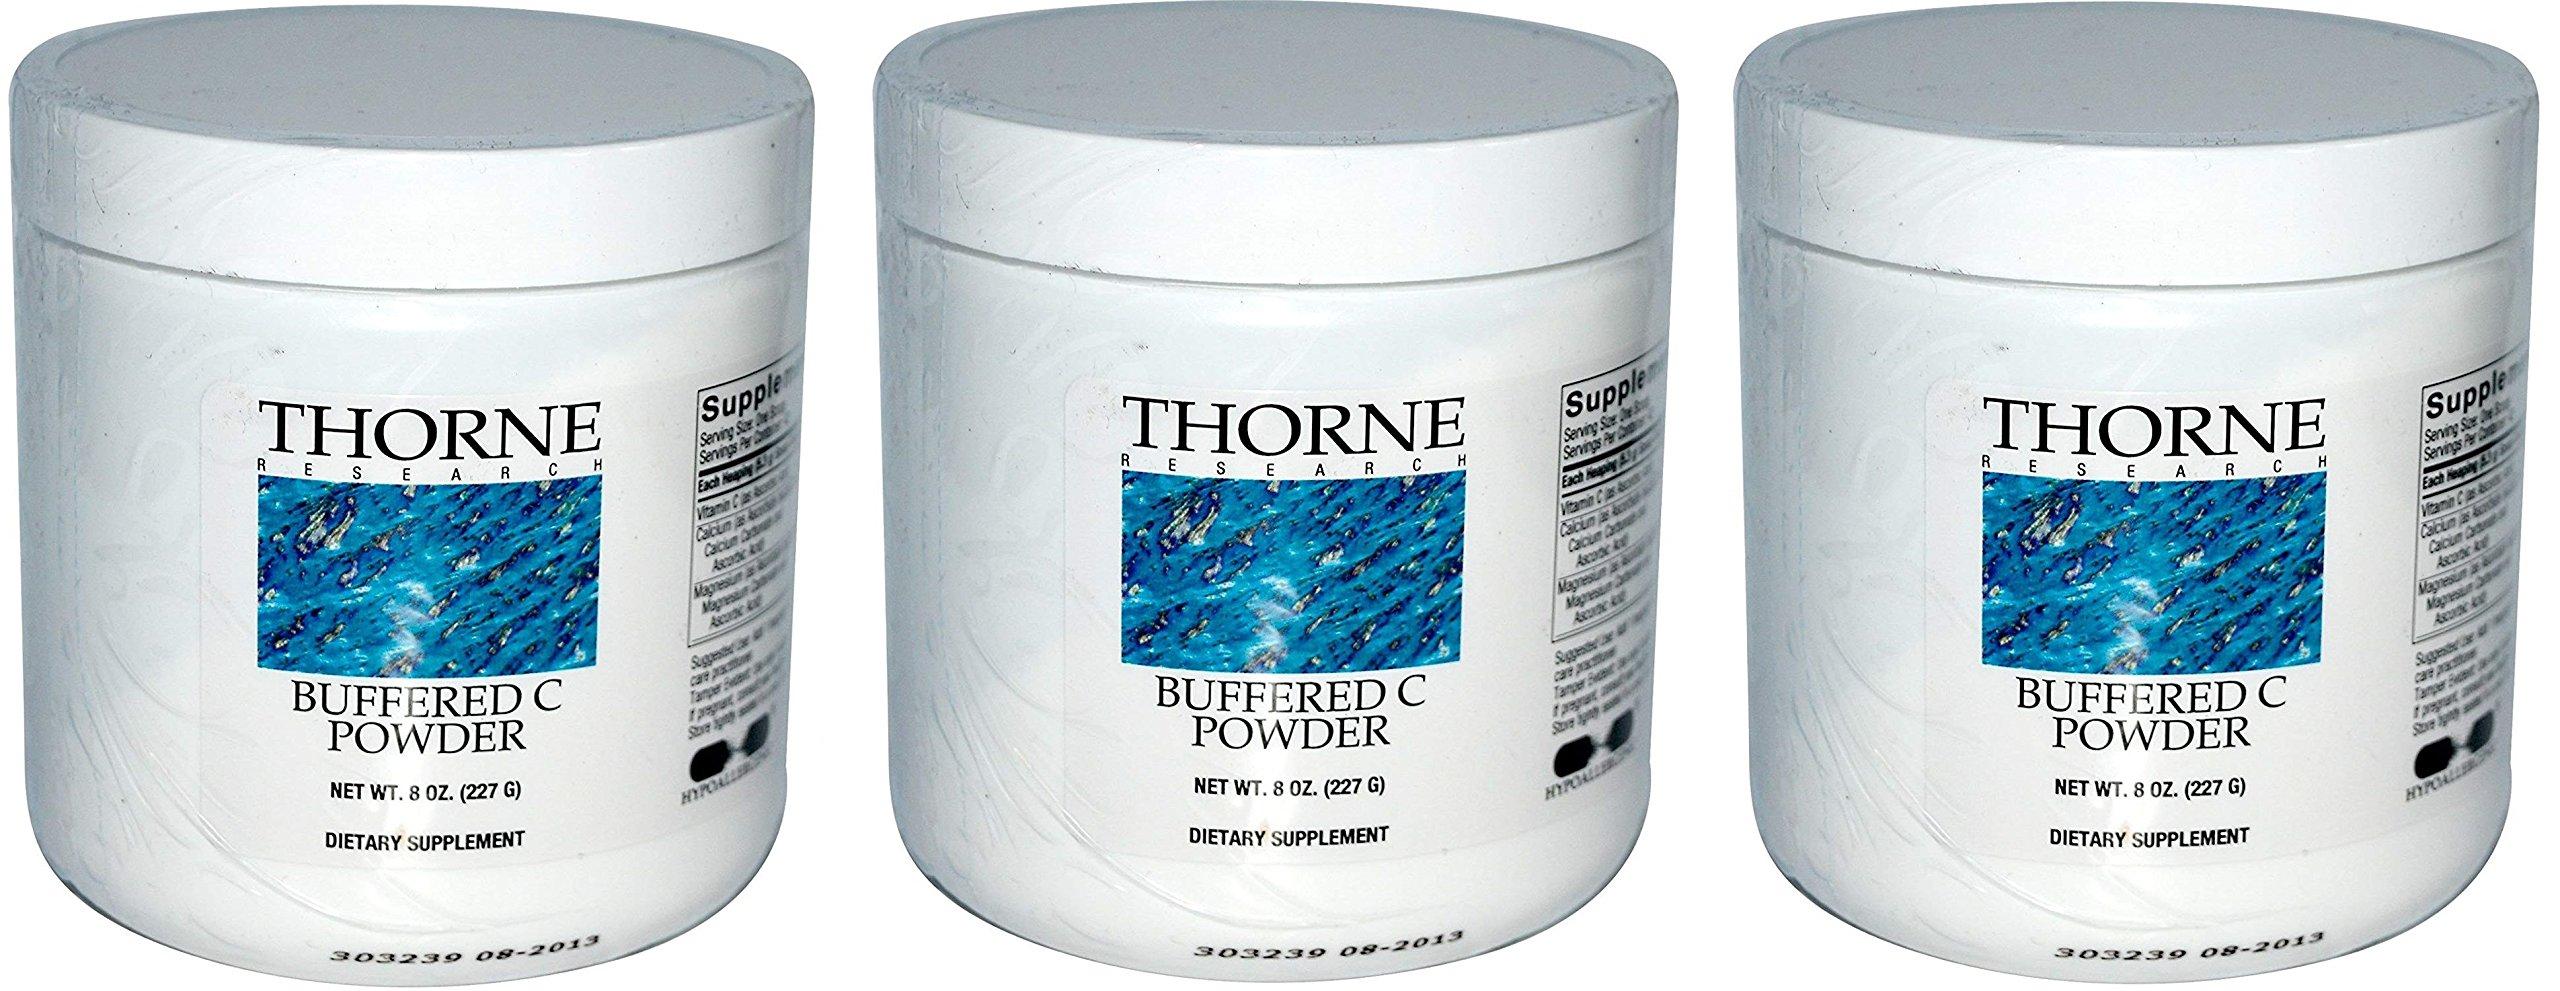 Buffered C Powder 8oz x 3 bottles 24oz total